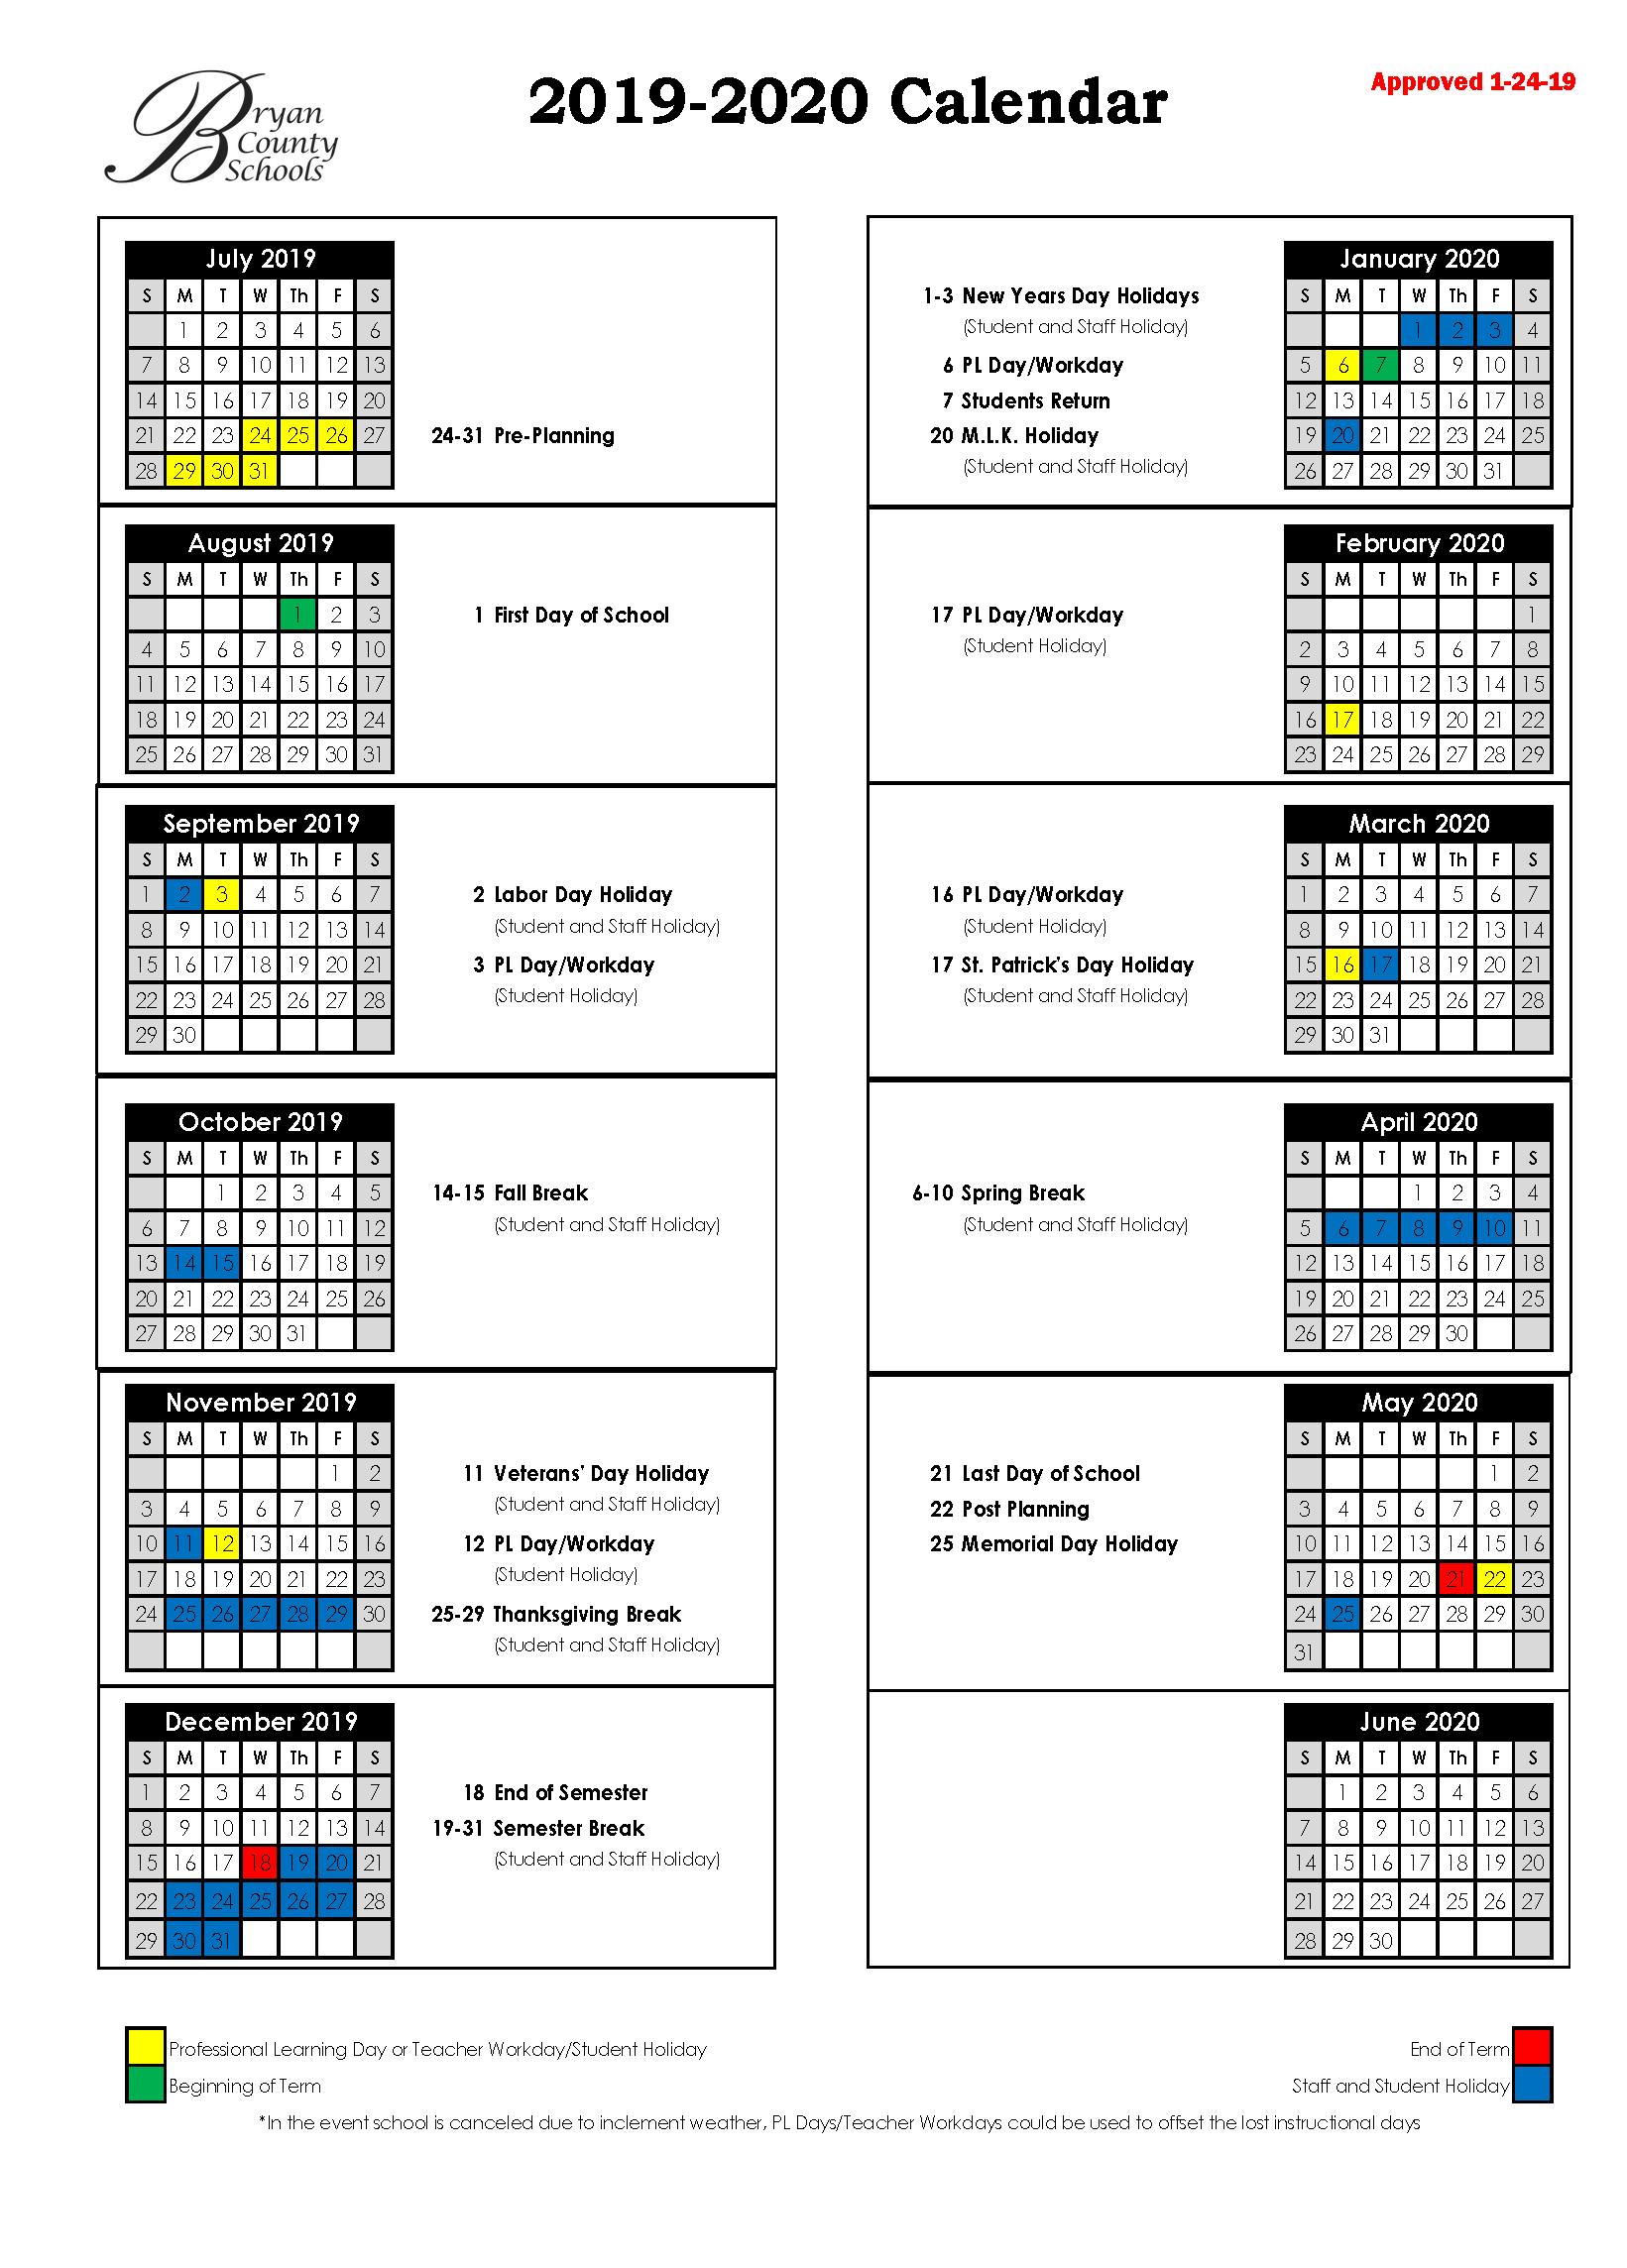 Bryan County Schools Within Board Of Education Calendar 2021 2020 Bibb County